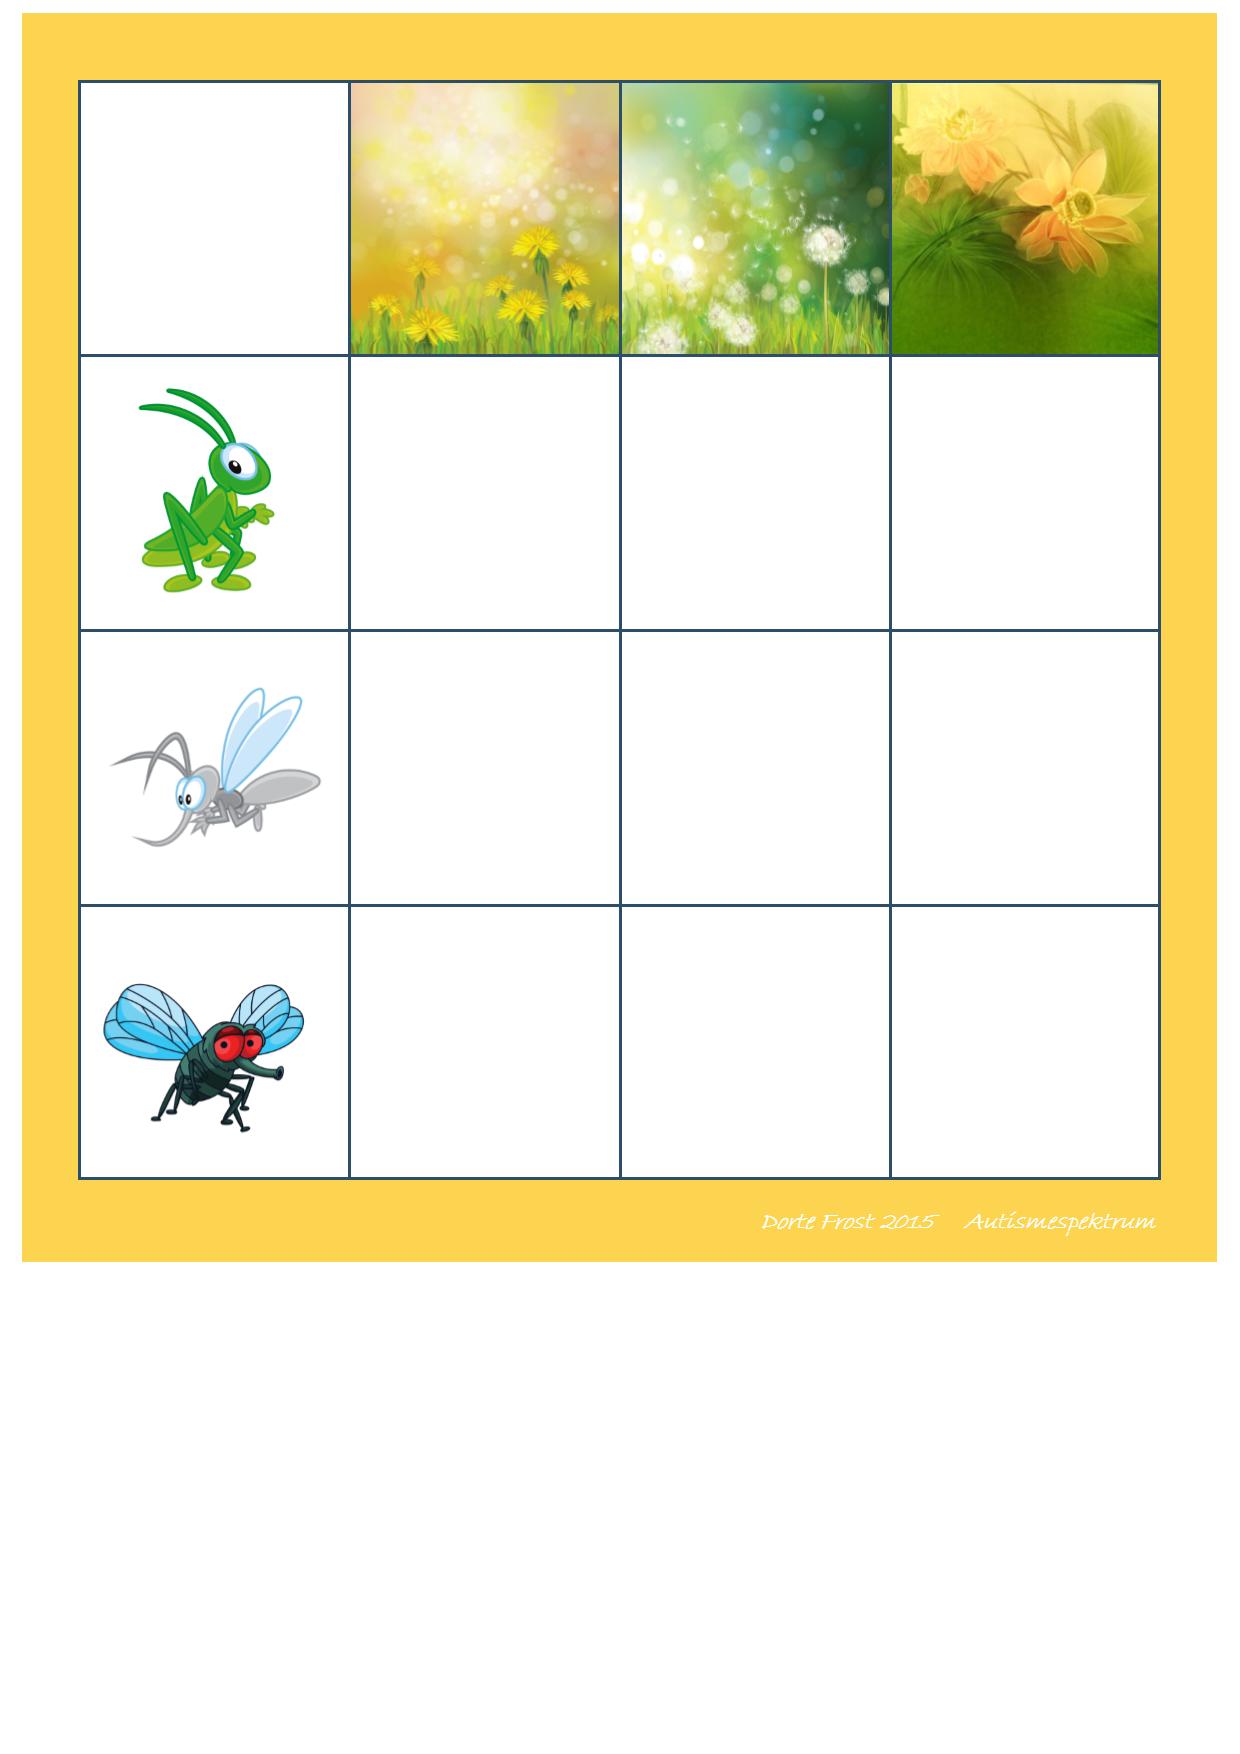 Board For The Matrix Game Find The Belonging Tiles On Autismespektrum On Pinterest By Autismespektrum Thema